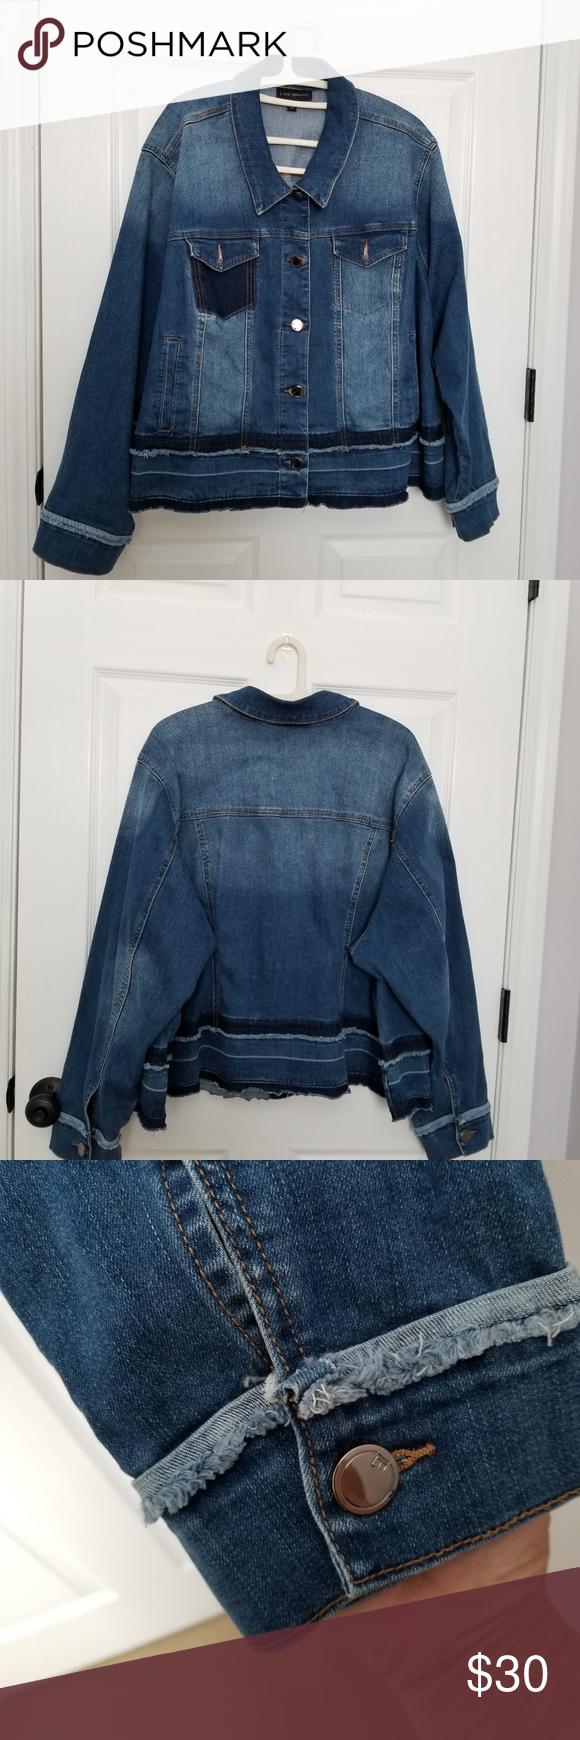 Lane Bryant Blue Denim Jacket Sz 28 Like New Denim Jacket Blue Denim Jacket Blue Denim [ 1740 x 580 Pixel ]